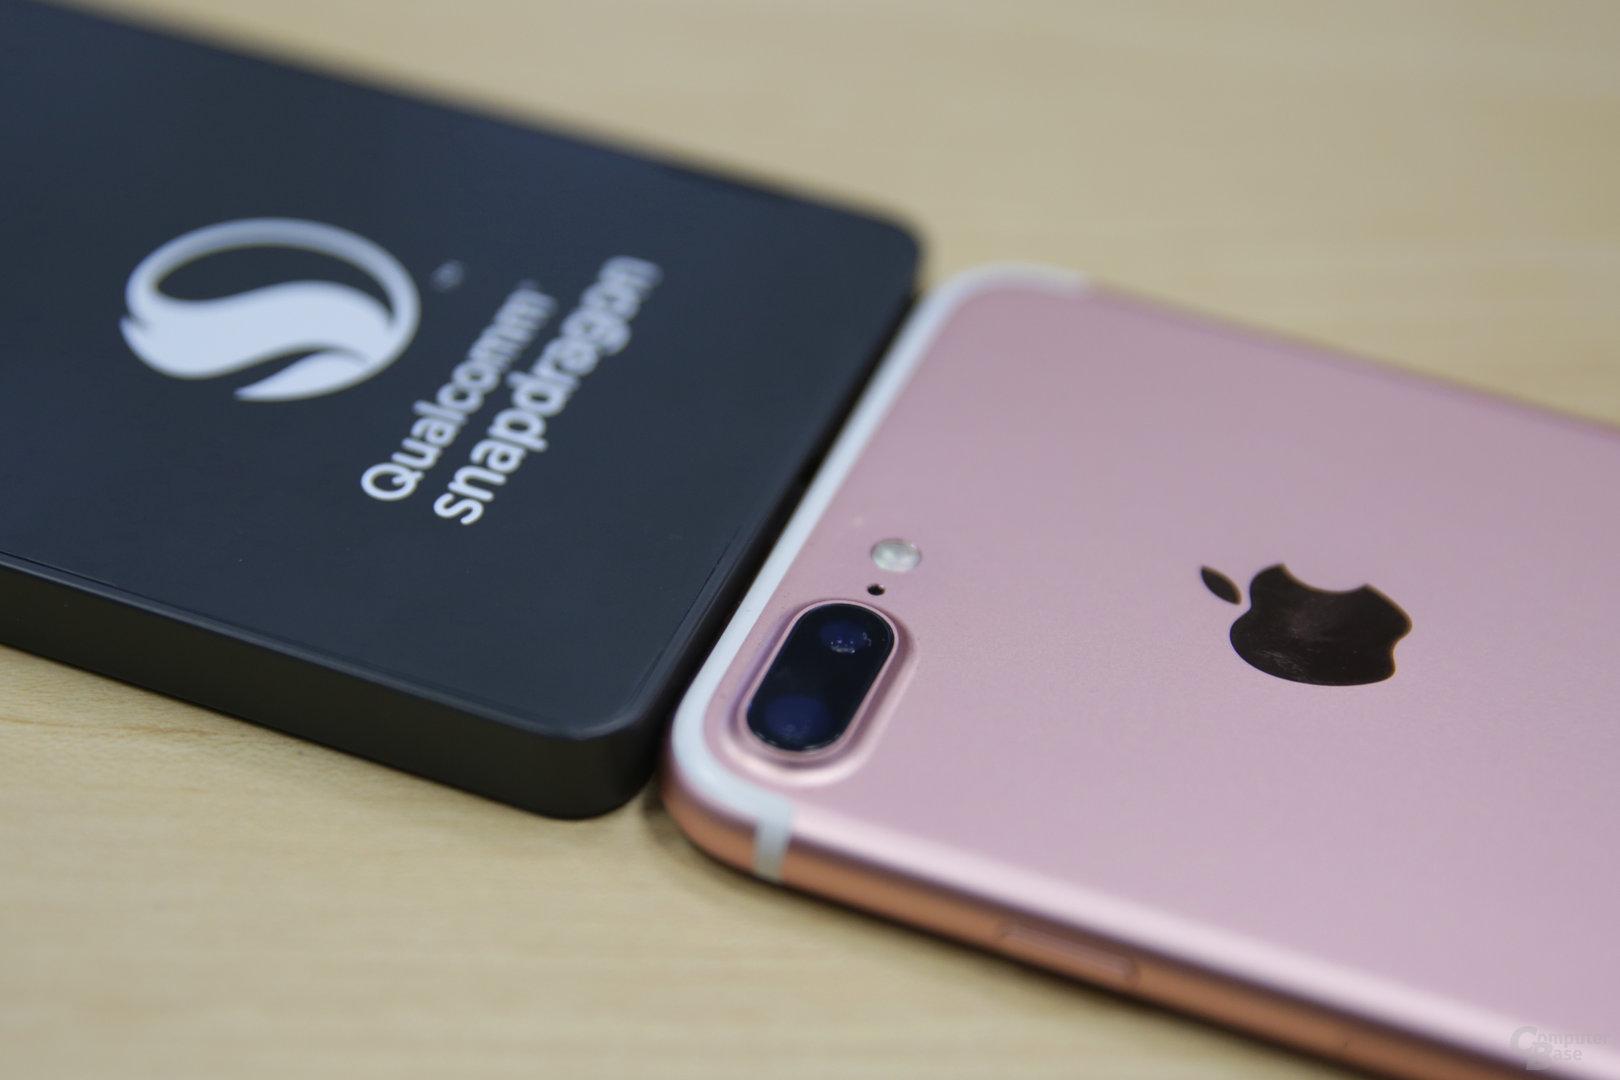 Snapdragon 835 QRD neben iPhone 7 Plus